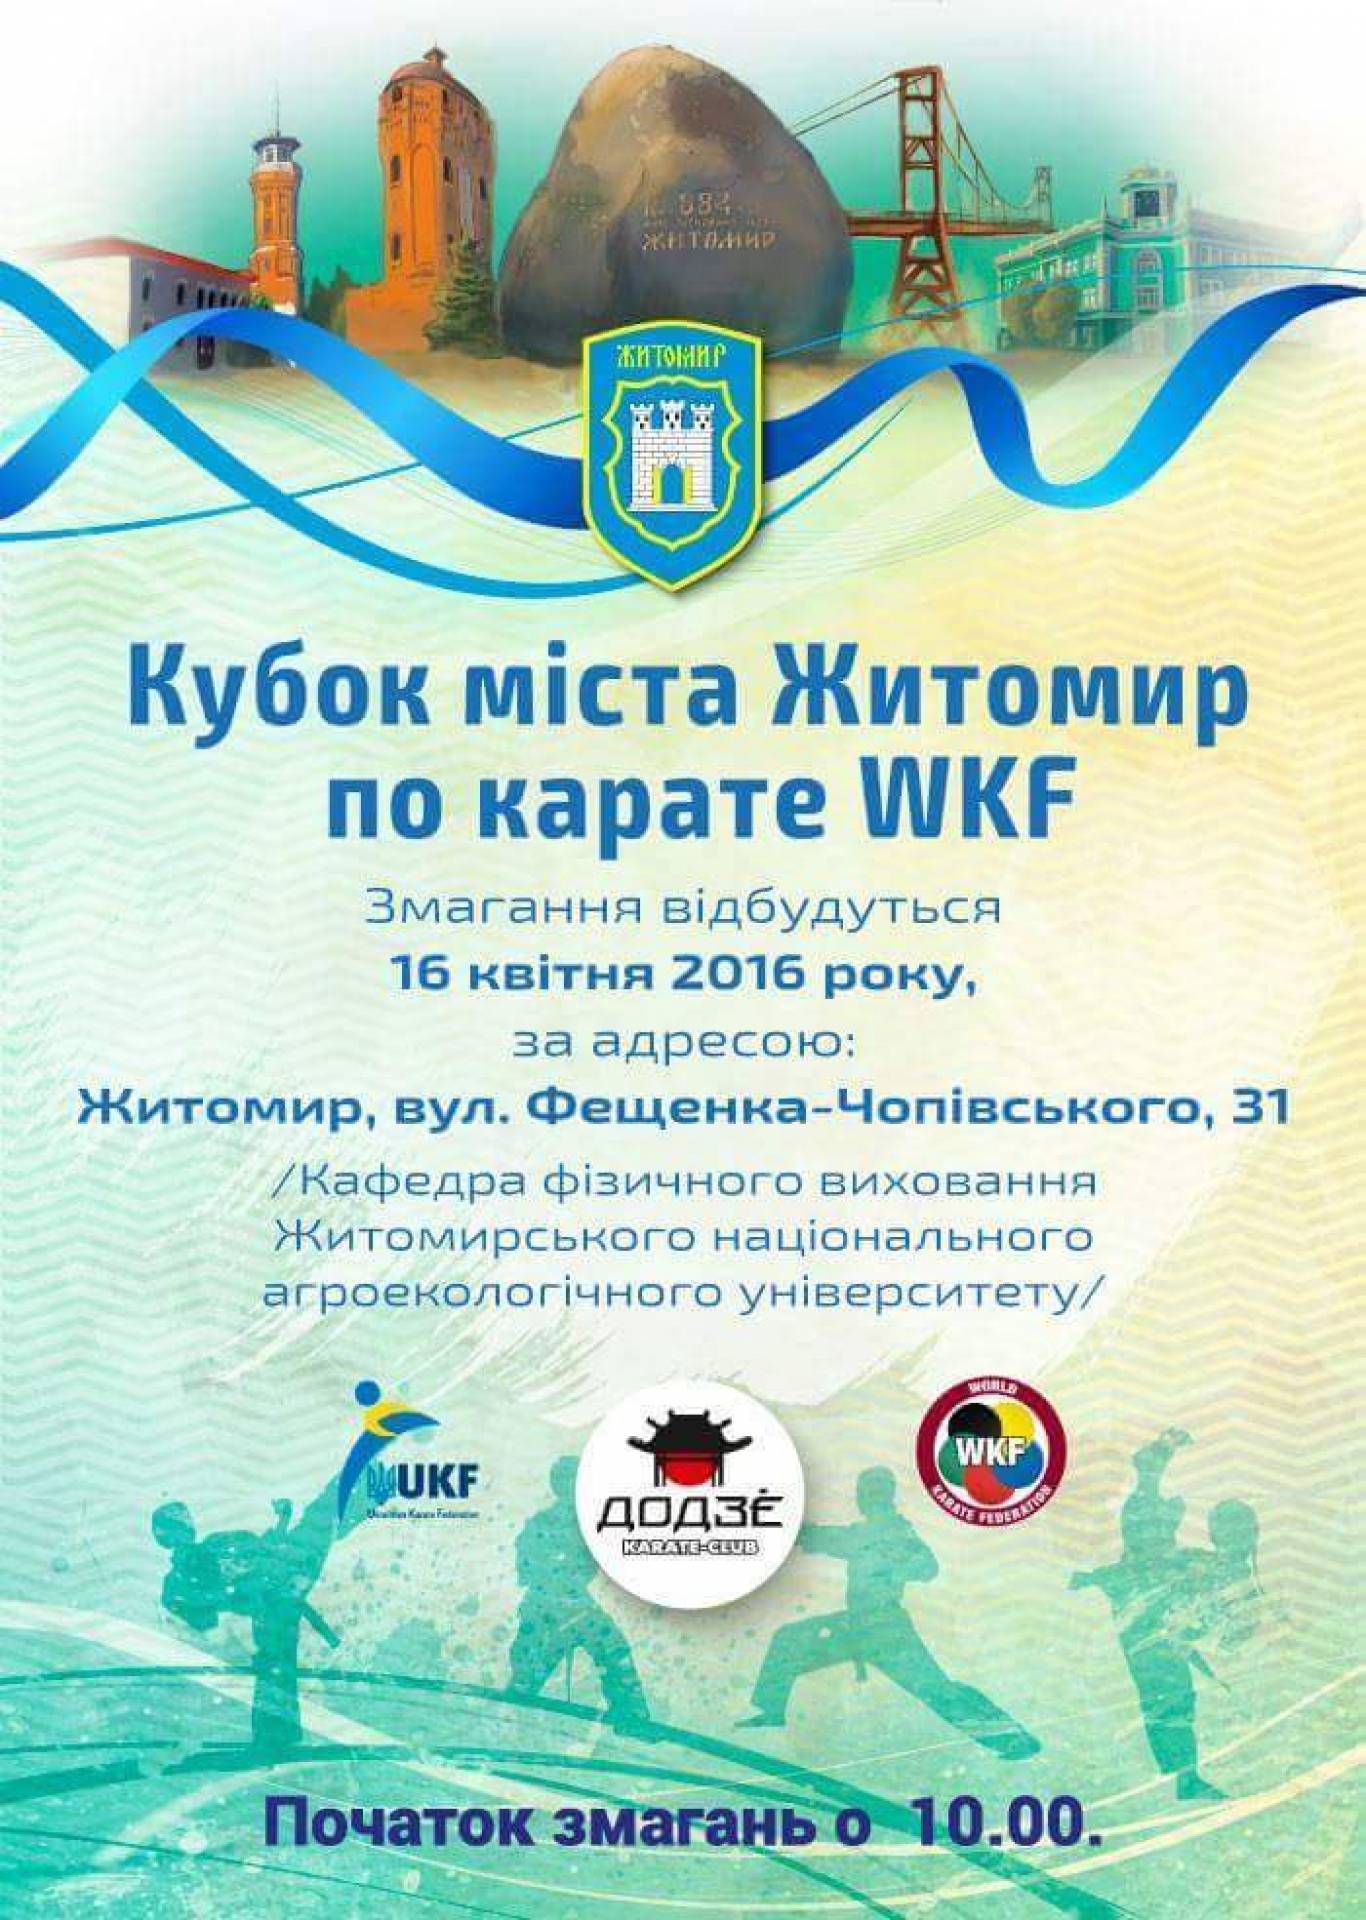 Кубок міста  Житомир по карате WKF